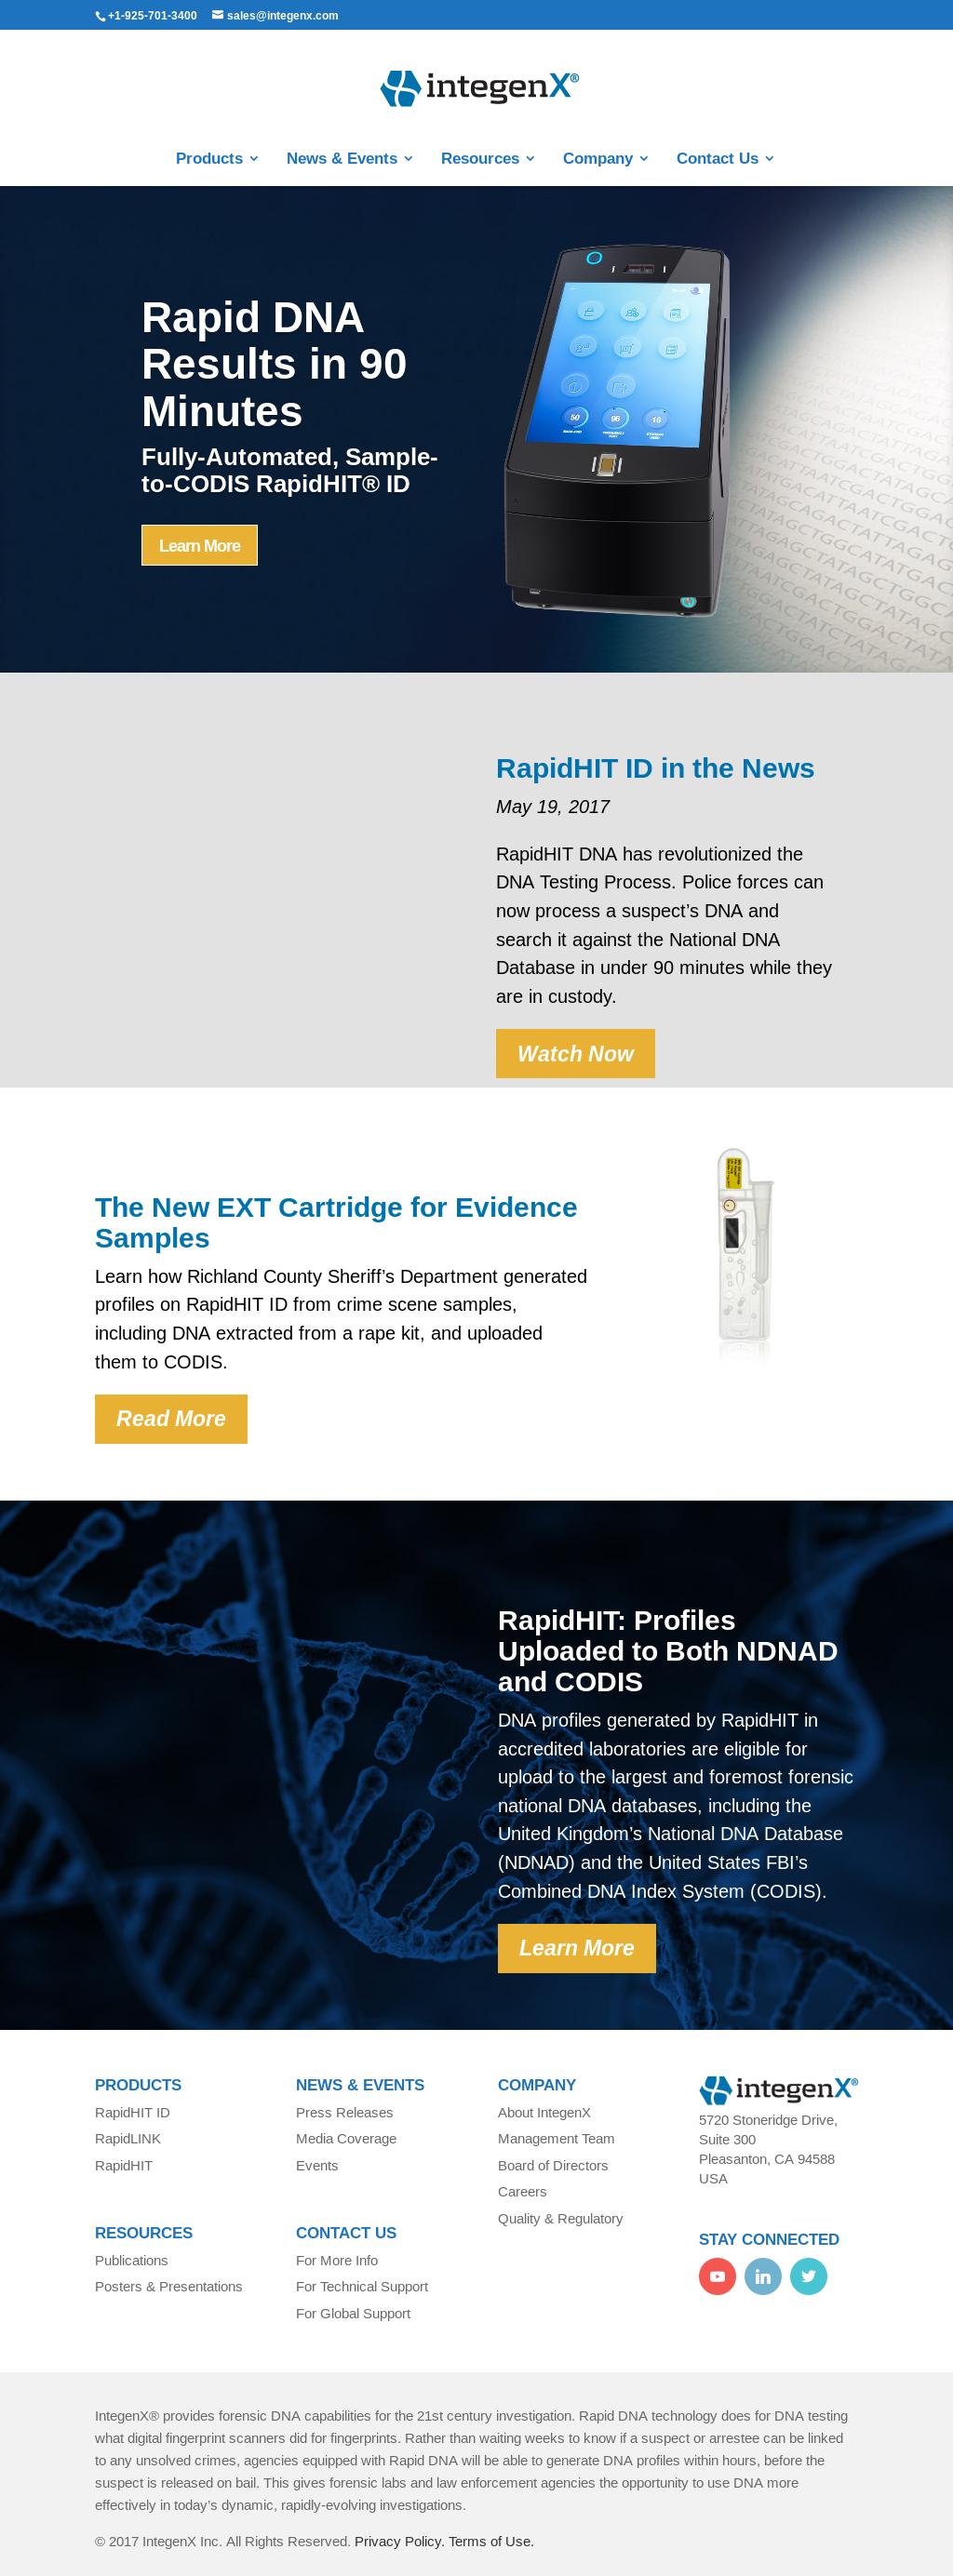 IntegenX Competitors, Revenue and Employees - Owler Company Profile